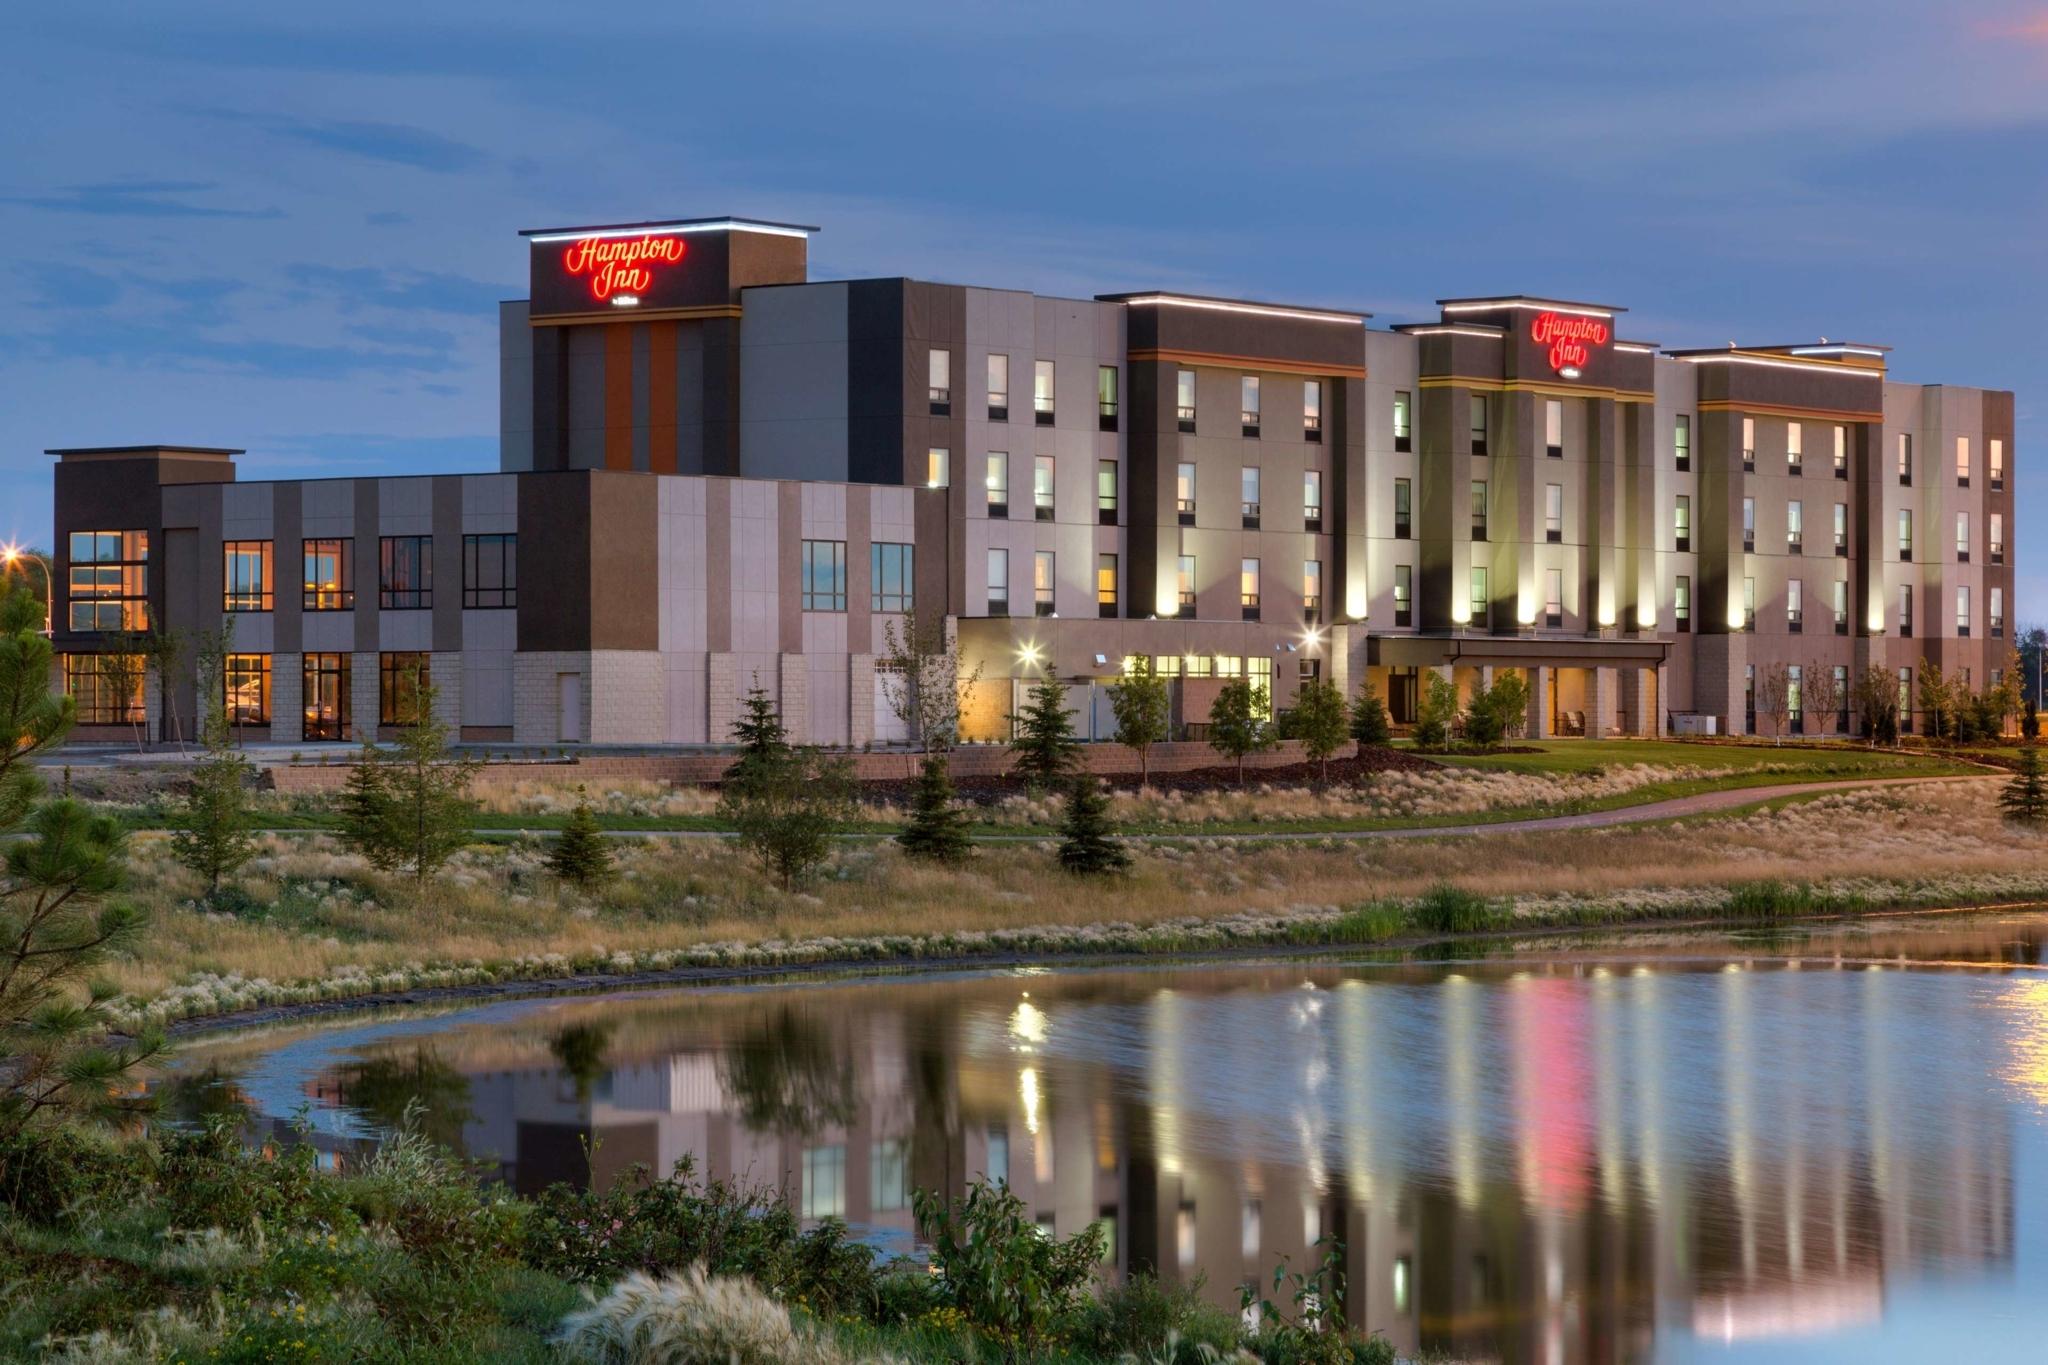 Hampton Inn by Hilton Edmonton/Sherwood Park - Hotels